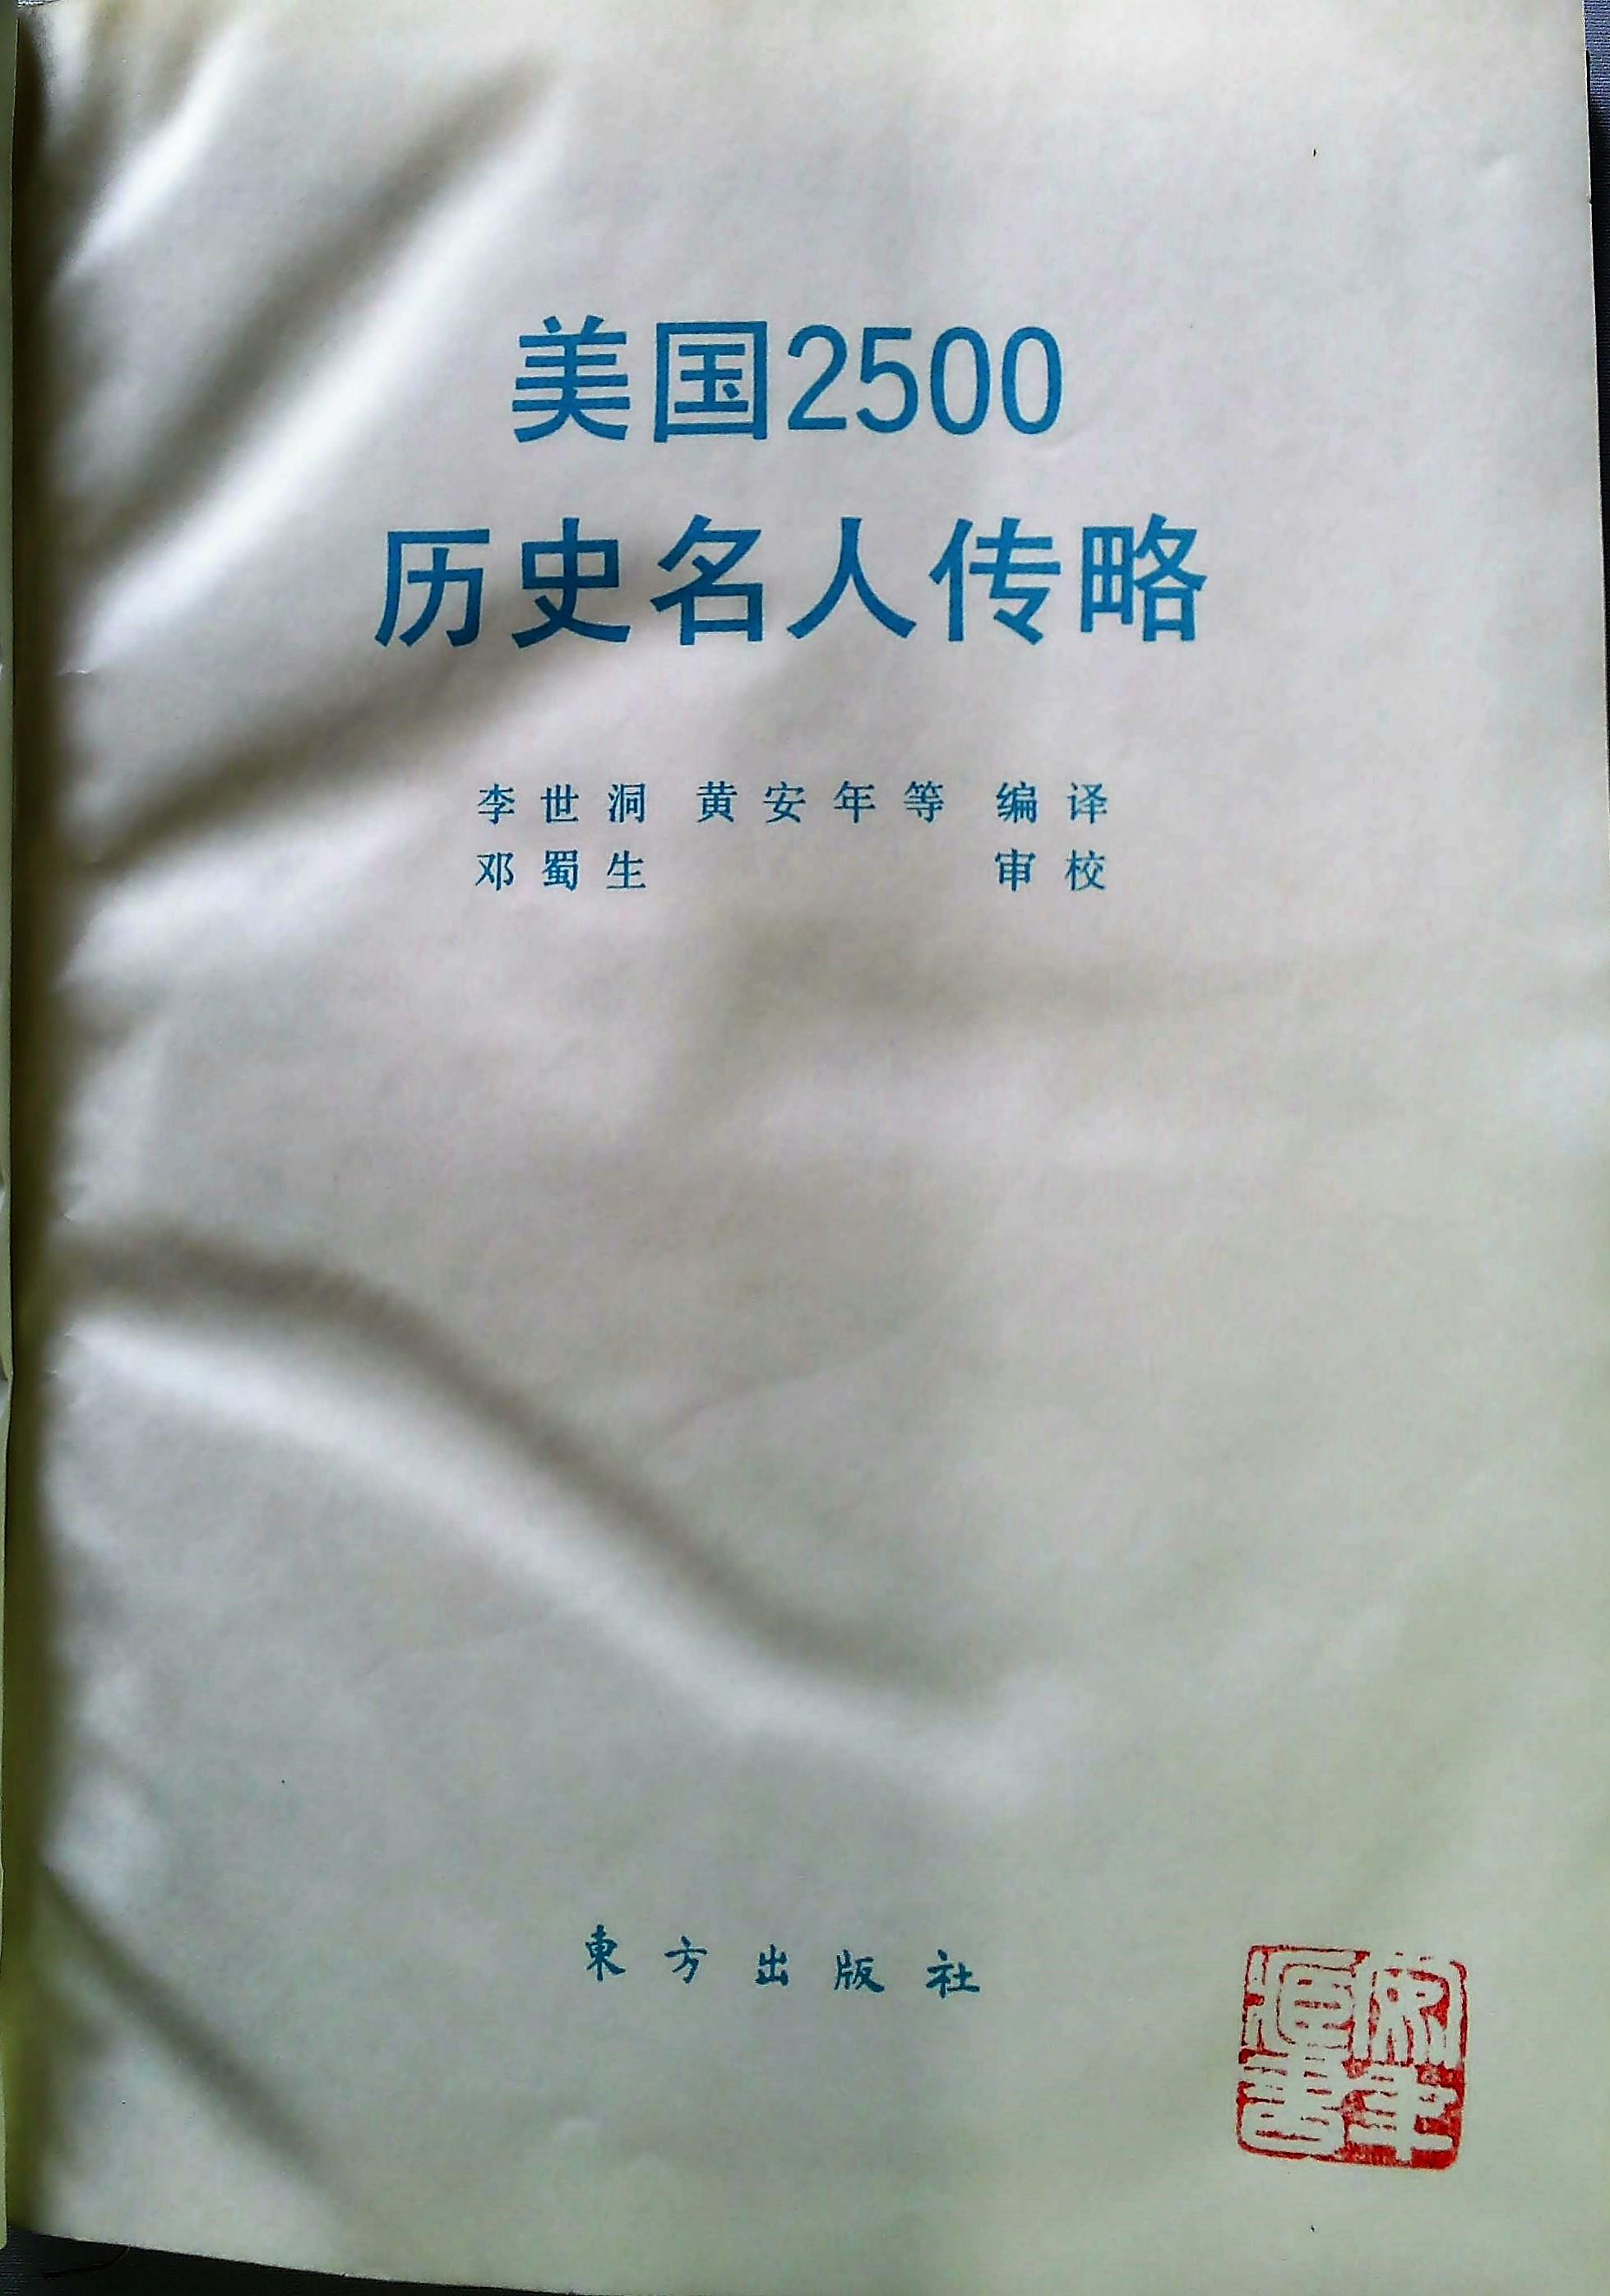 3 IMG557.jpg